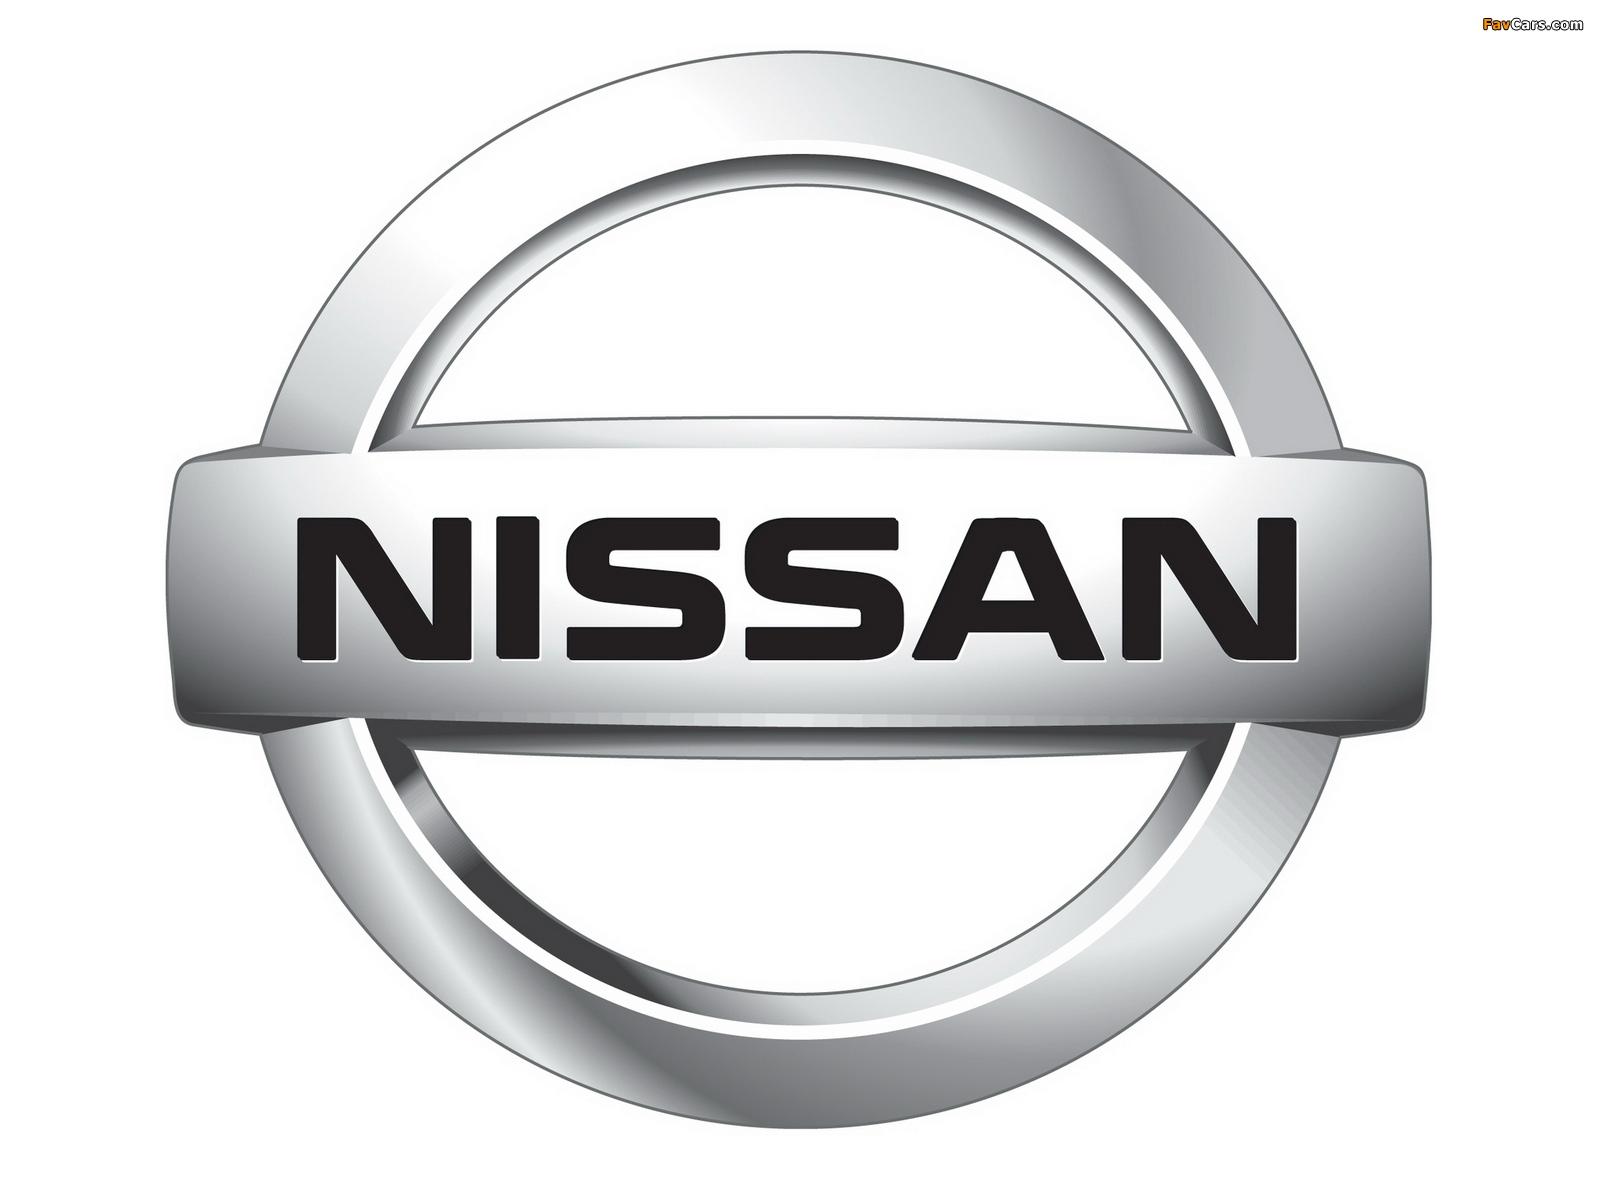 Nissan images (1600 x 1200)